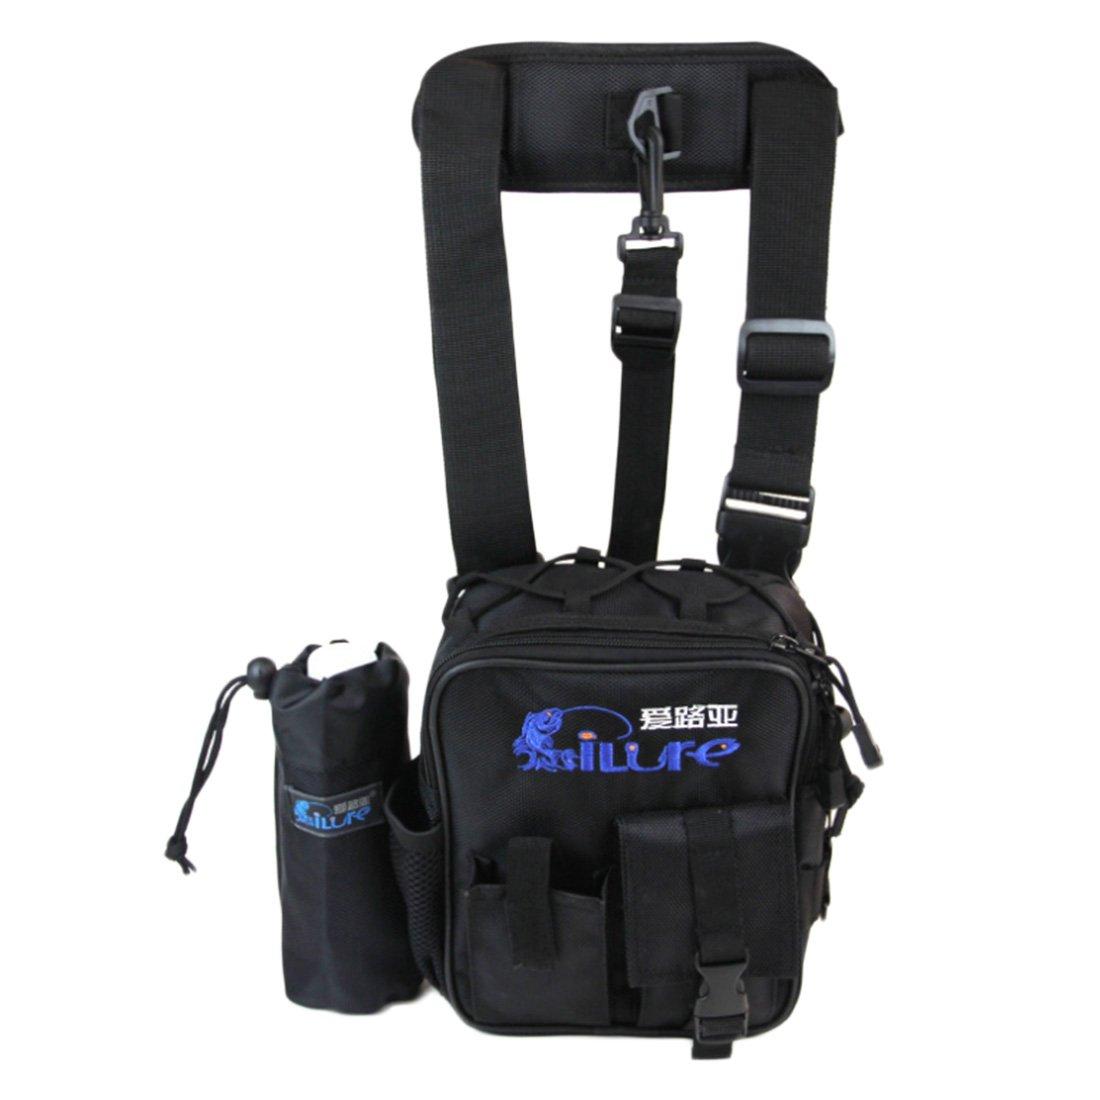 yapeachアウトドア釣りバッグ、防水釣りギアバッグ、多機能ウエストバッグwith水ボトルバッグ  ブラック B07C74PBYG